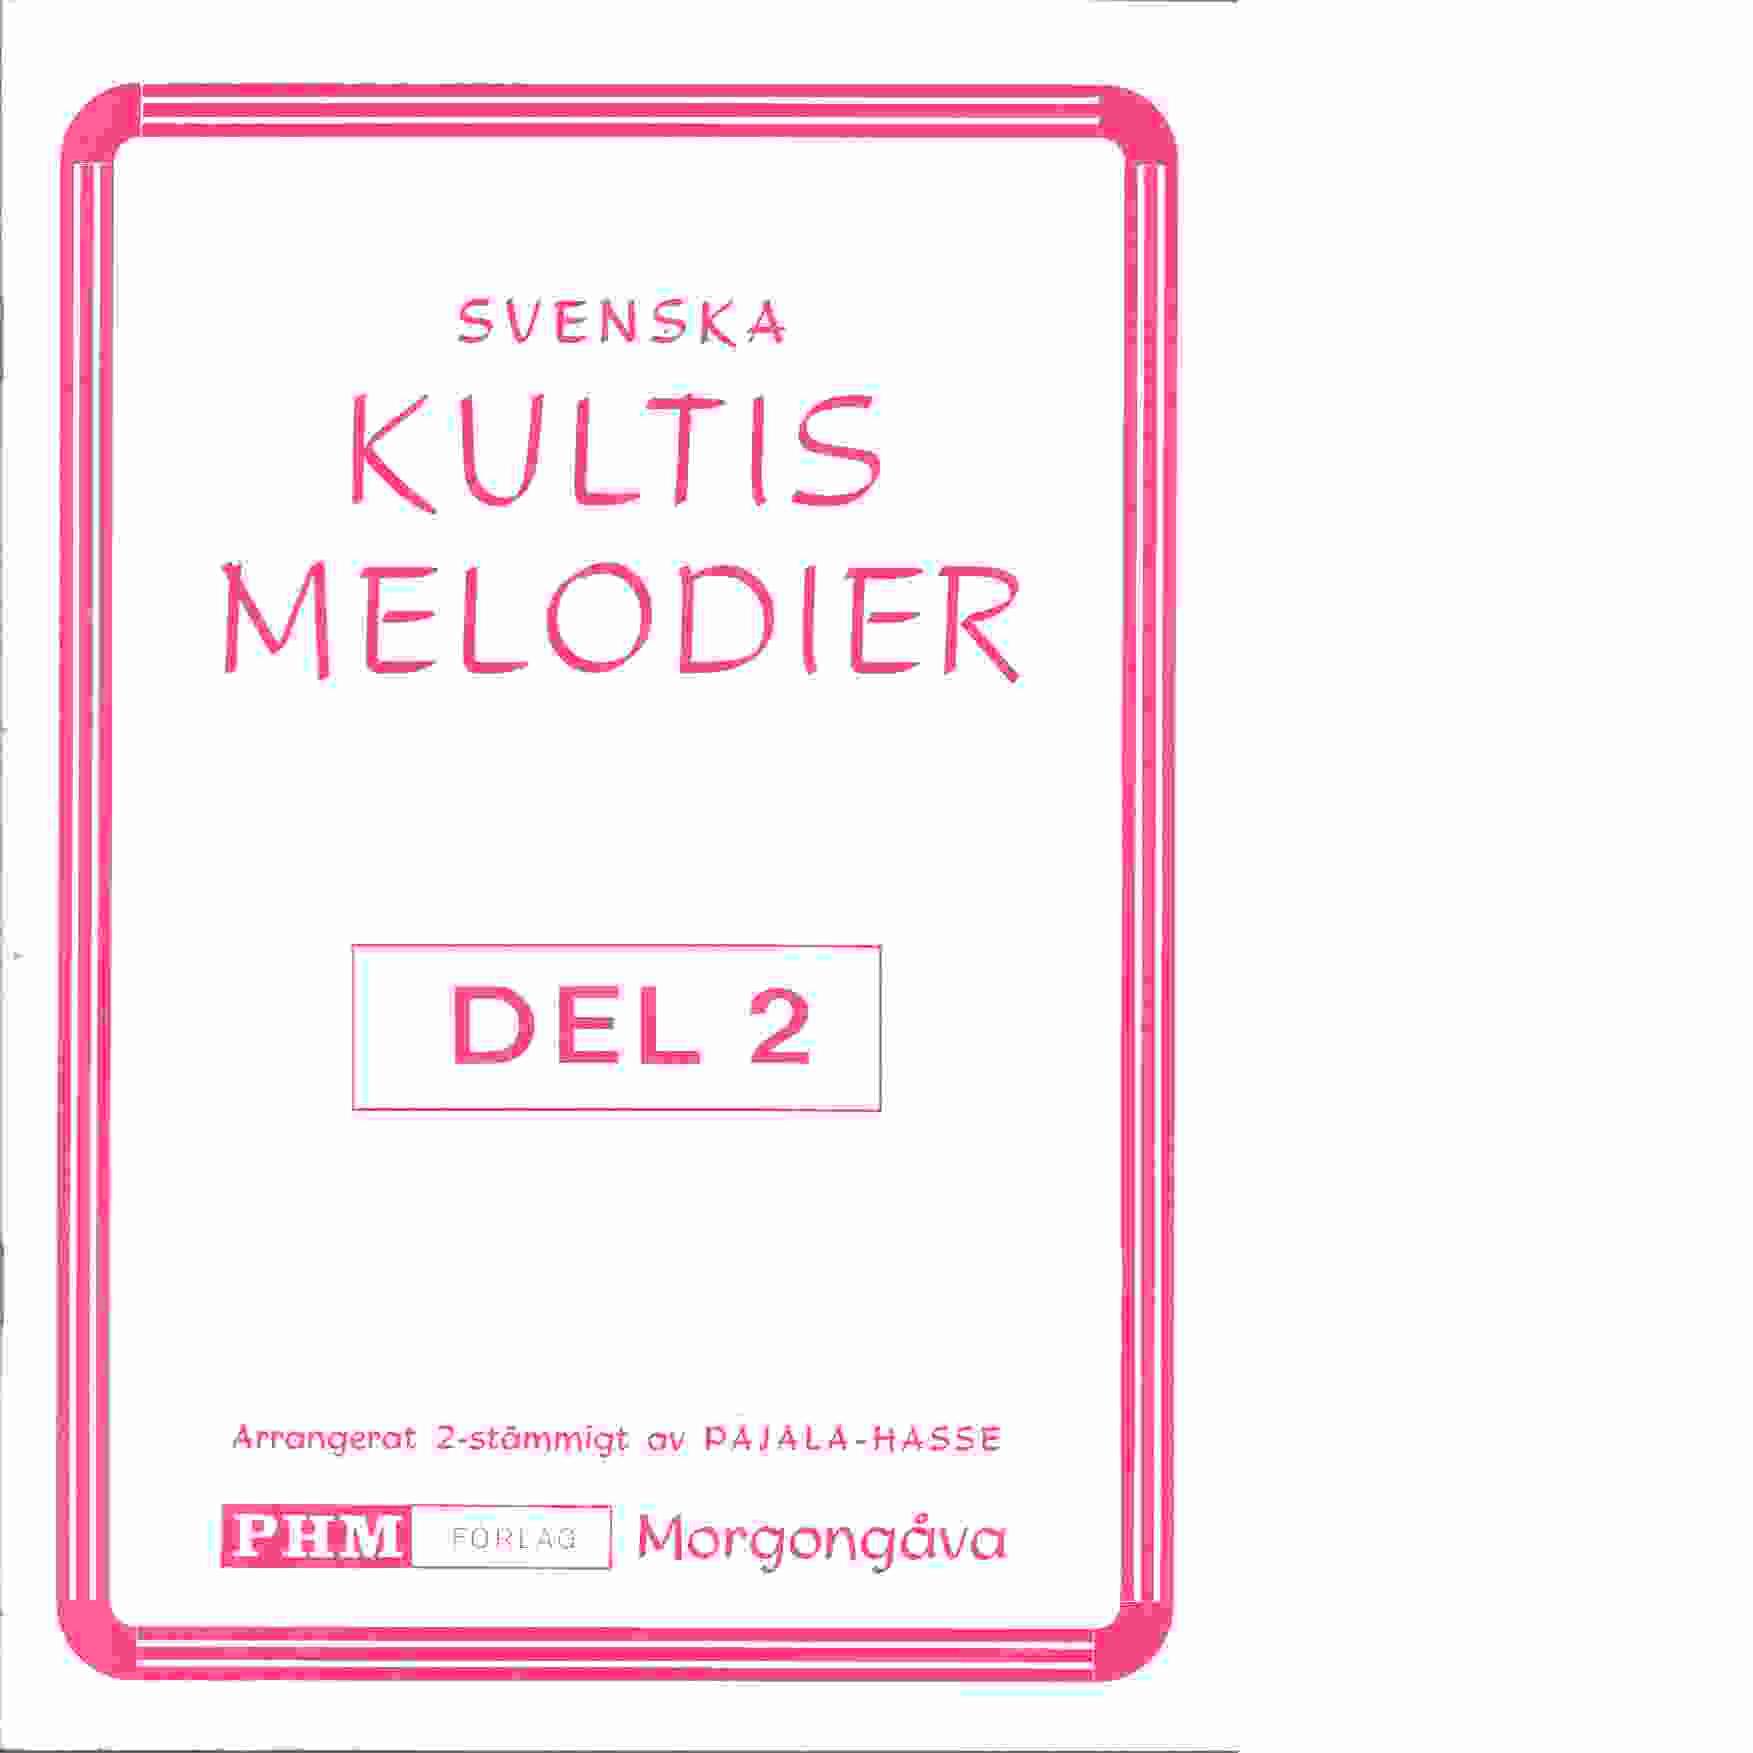 Svenska kultis melodier del 2 - Pajala-Hasse